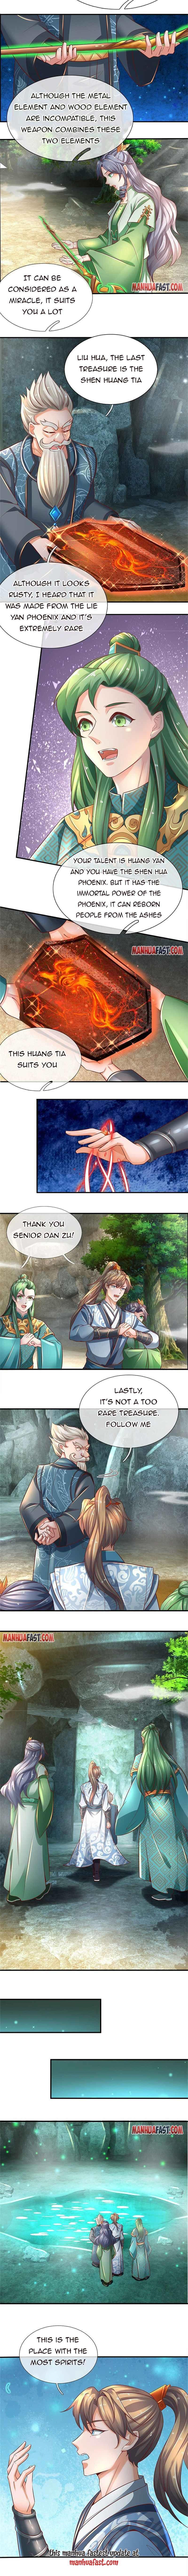 Marvelous Hero Of The Sword Chapter 345 page 3 - Mangakakalots.com